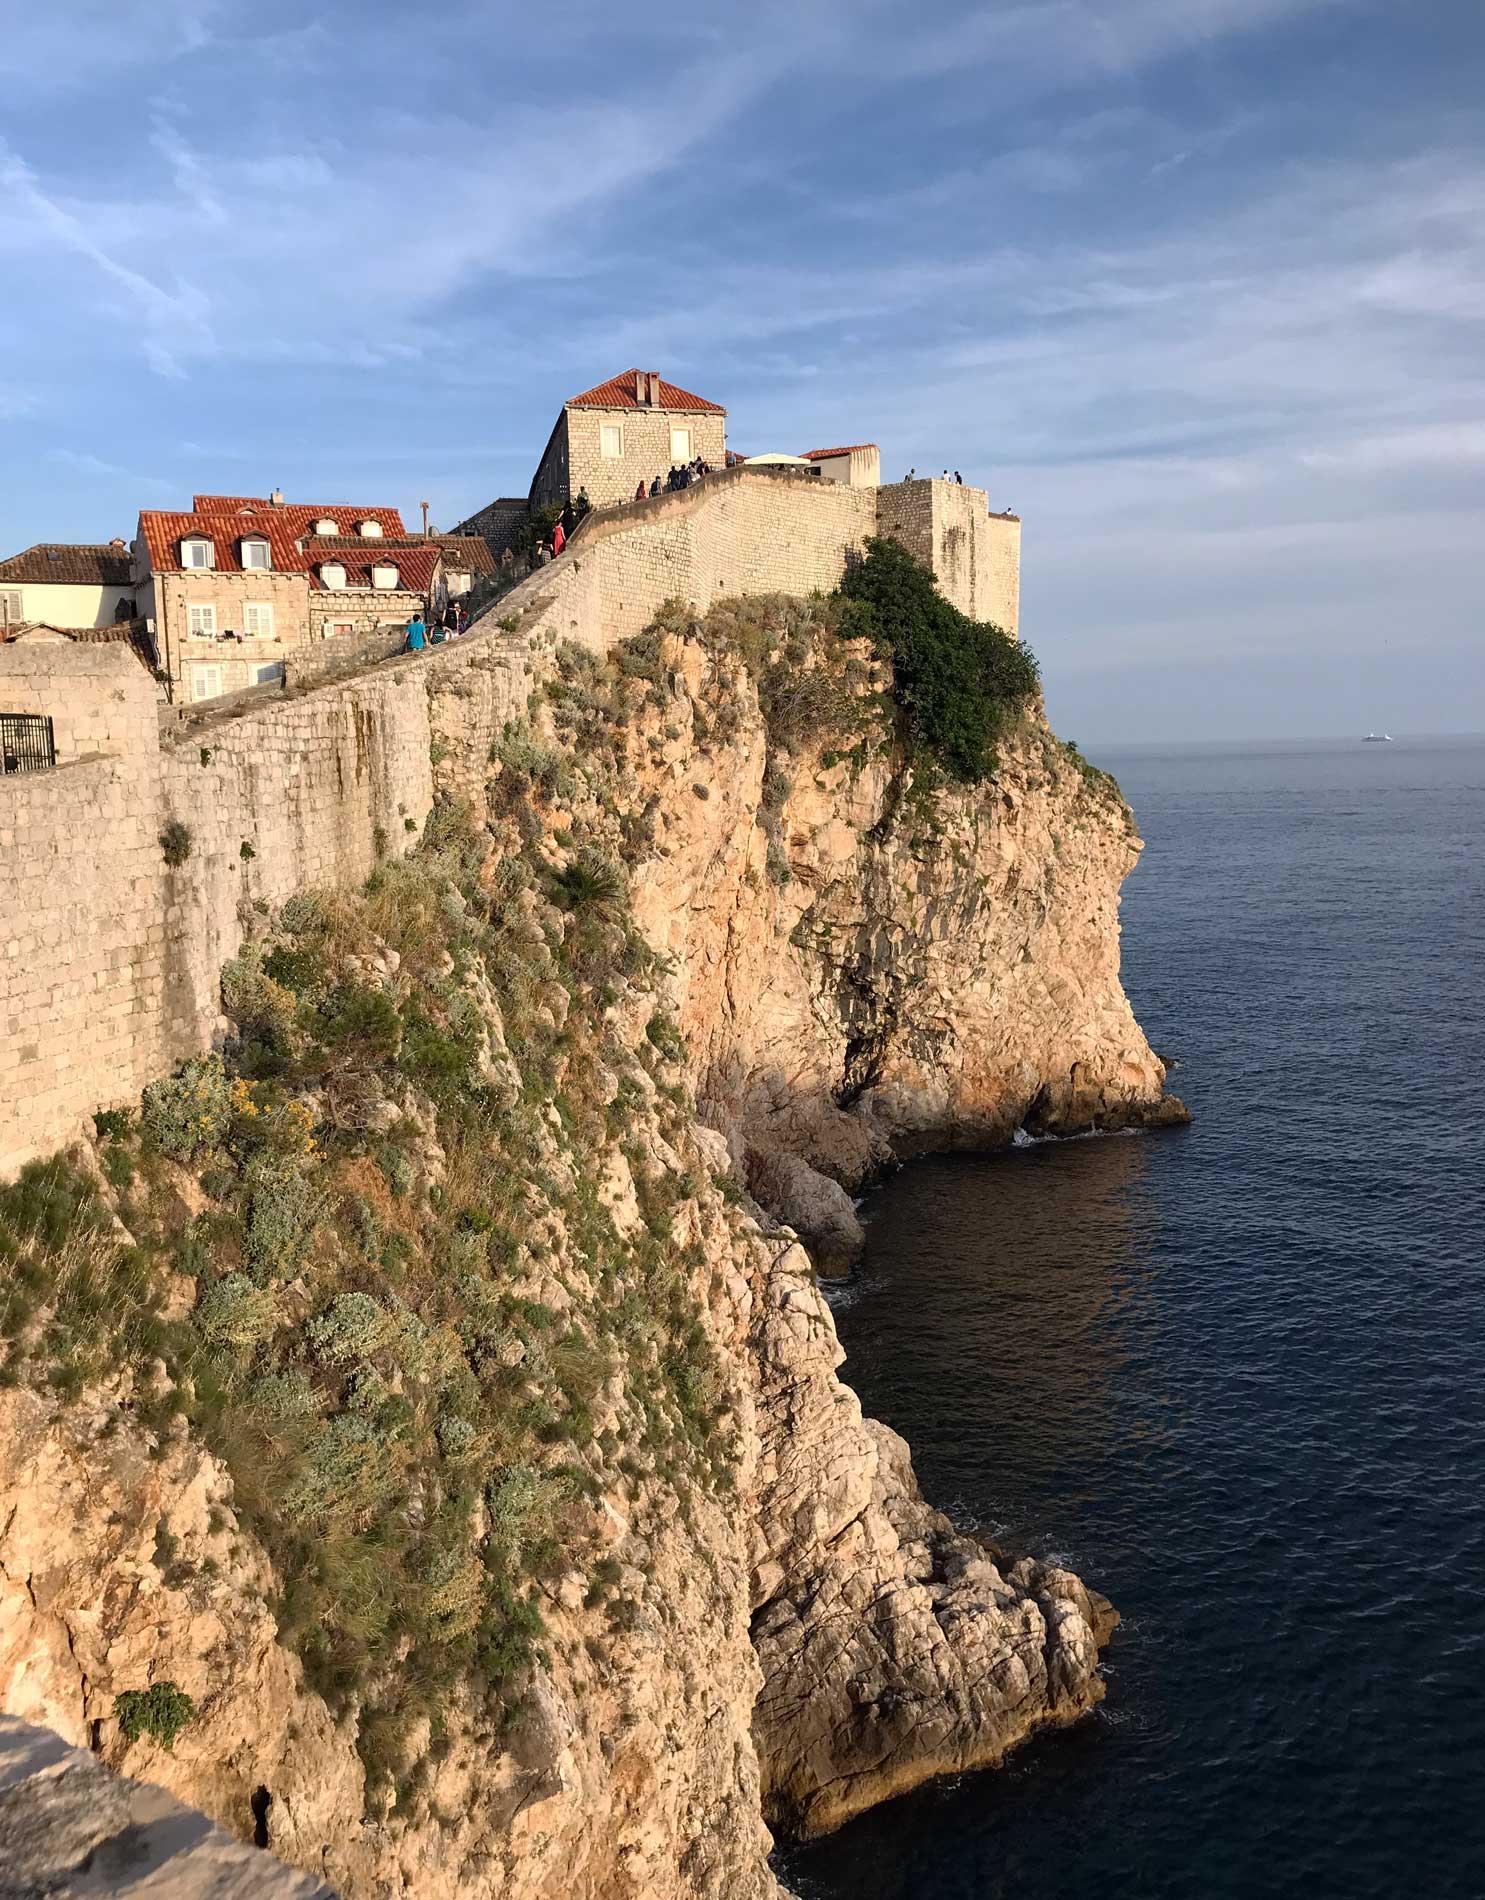 Dubrovnik-Croazia-vista-dalle-mura-mare-Adriatico-torri